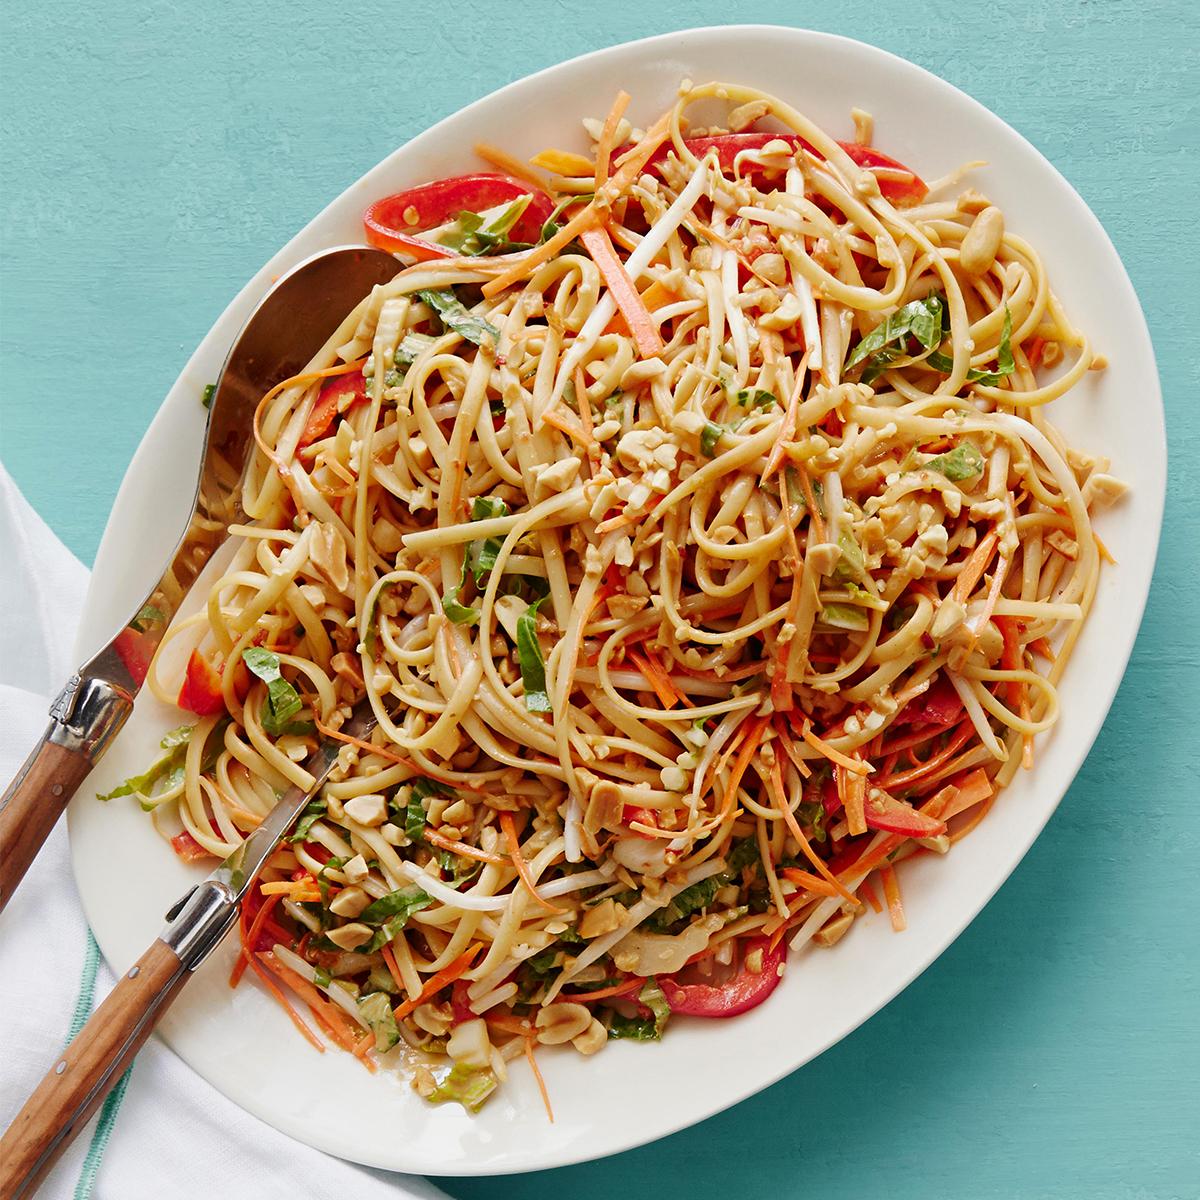 peanut noodles with veggies